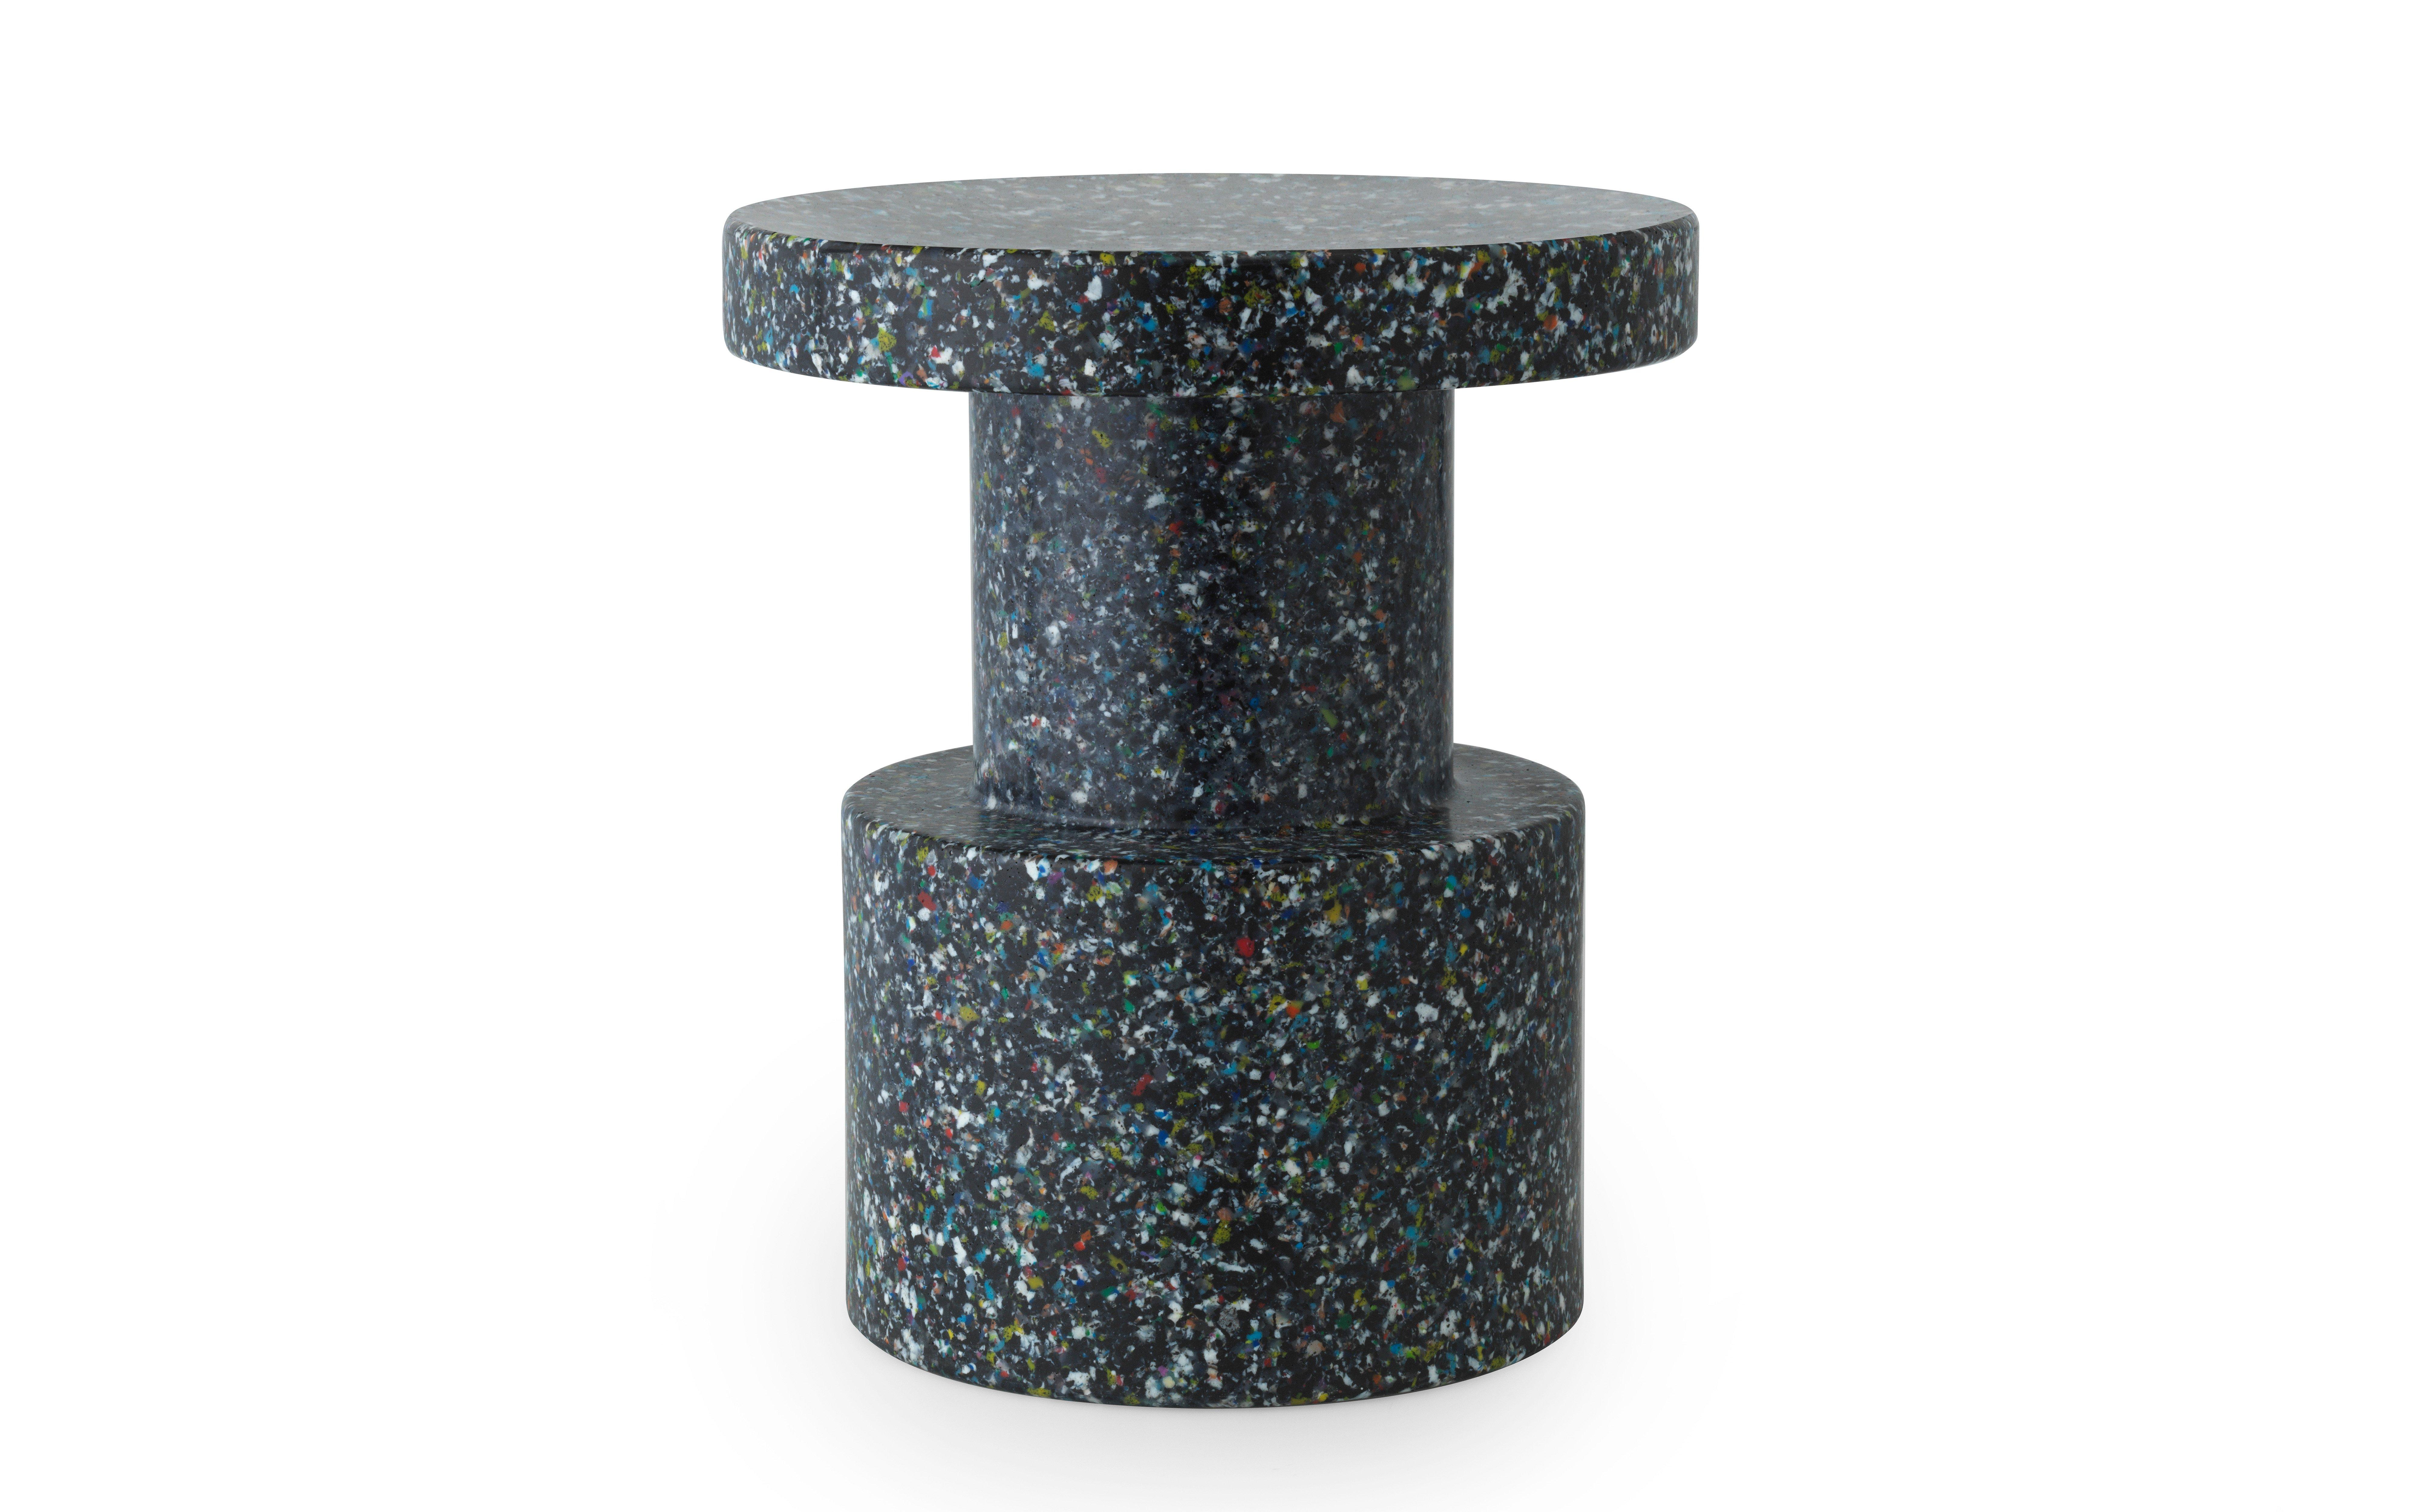 Normann Copenhagen - Bit Table / Stool - Black Multi (603008)